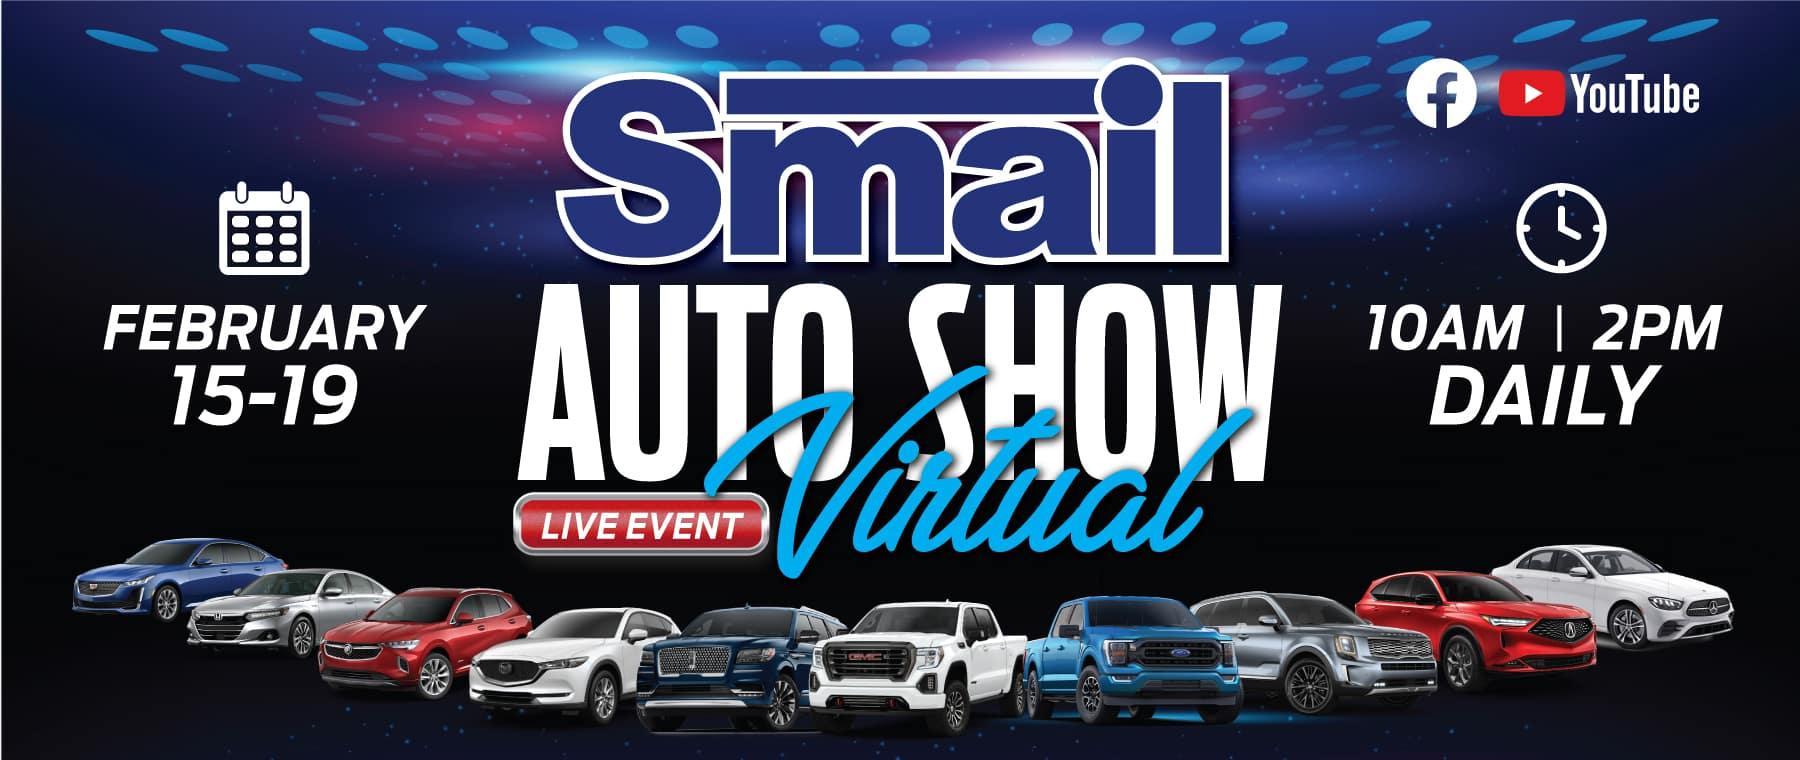 2021 Smail Virtual Auto Show!